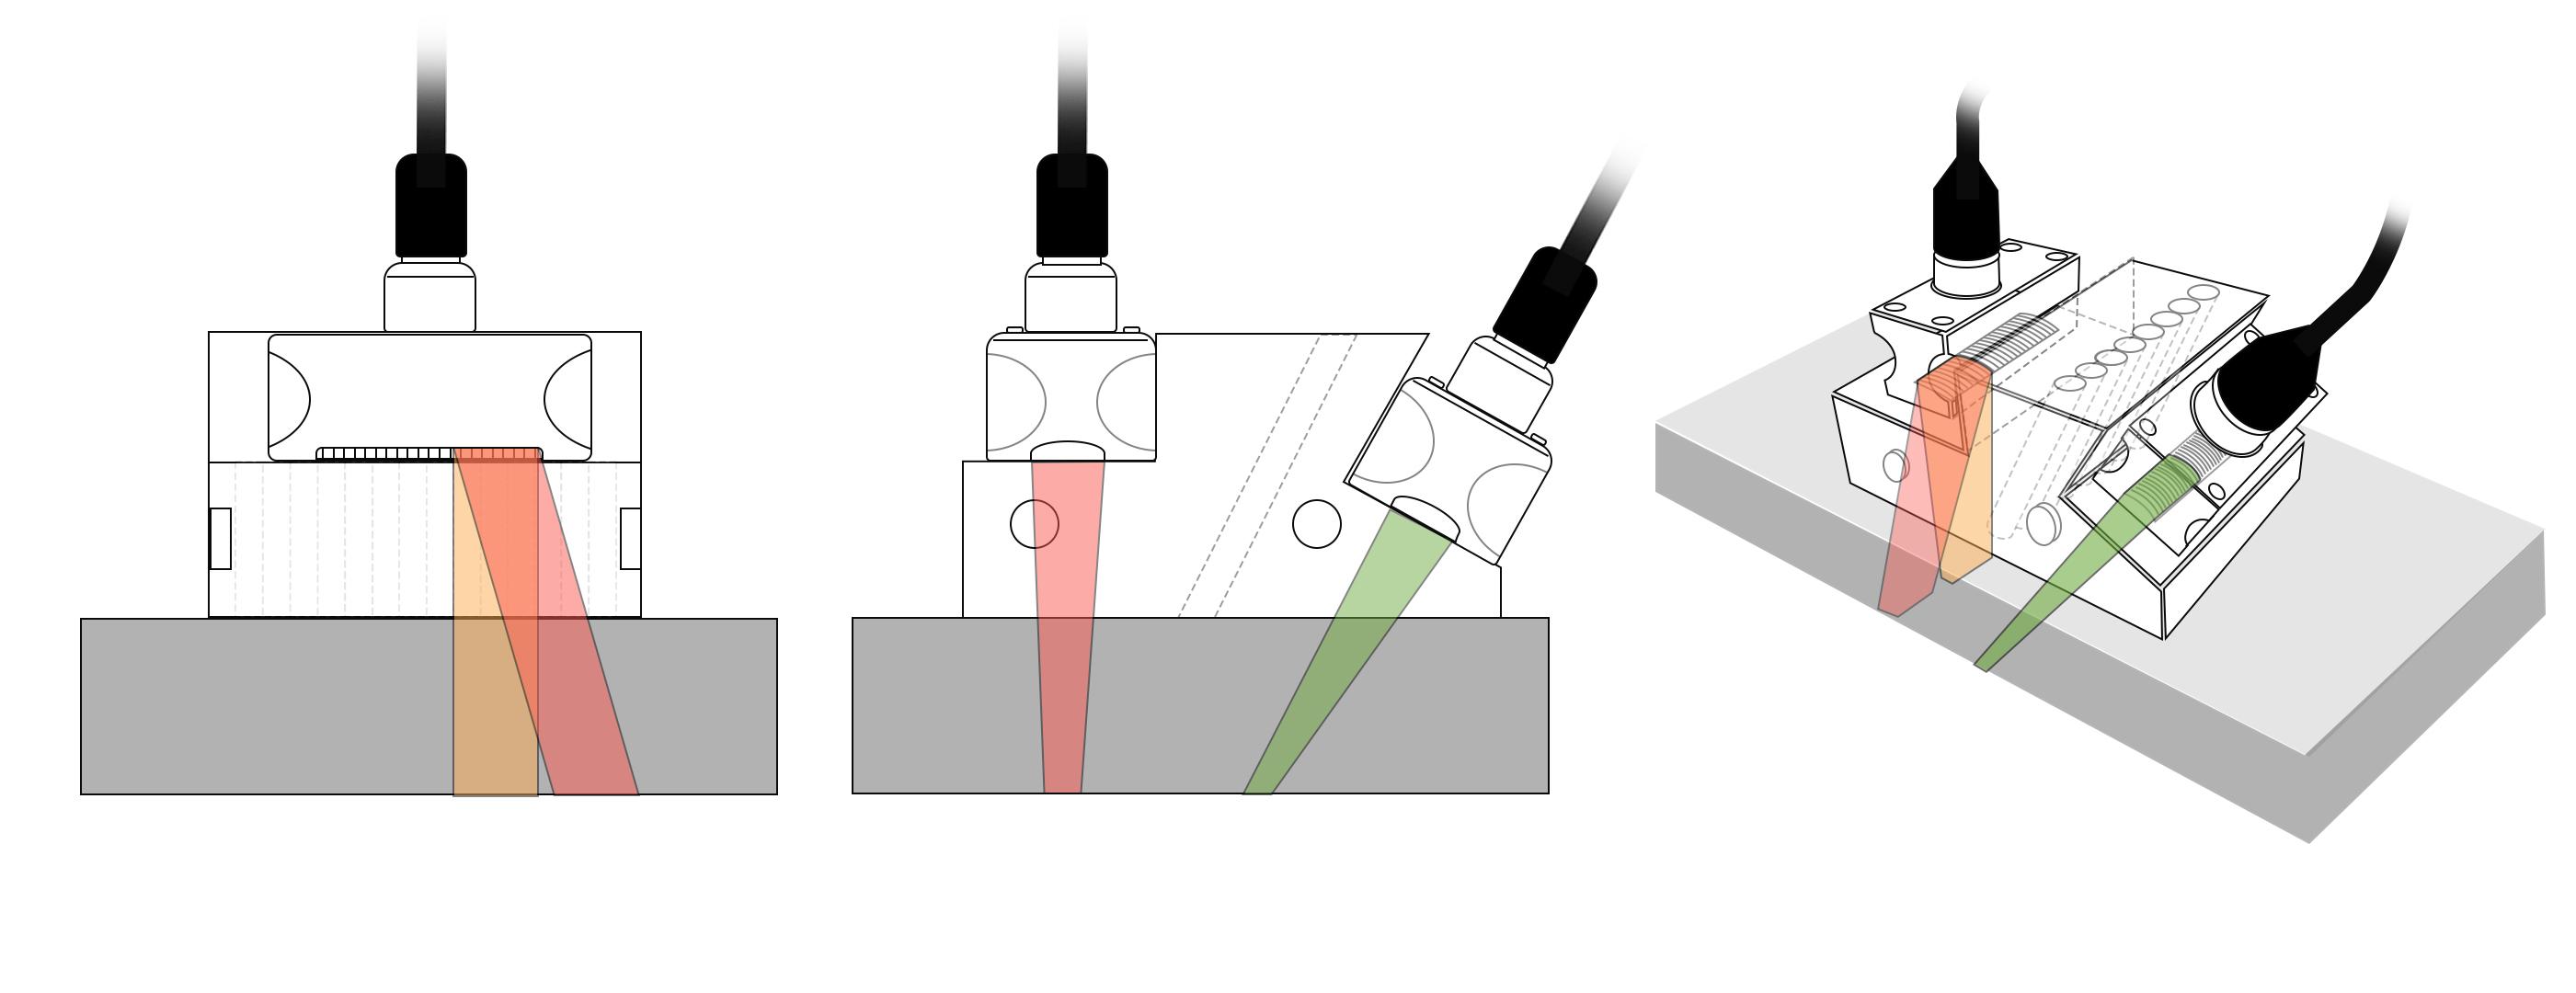 TriLateral_Diagram